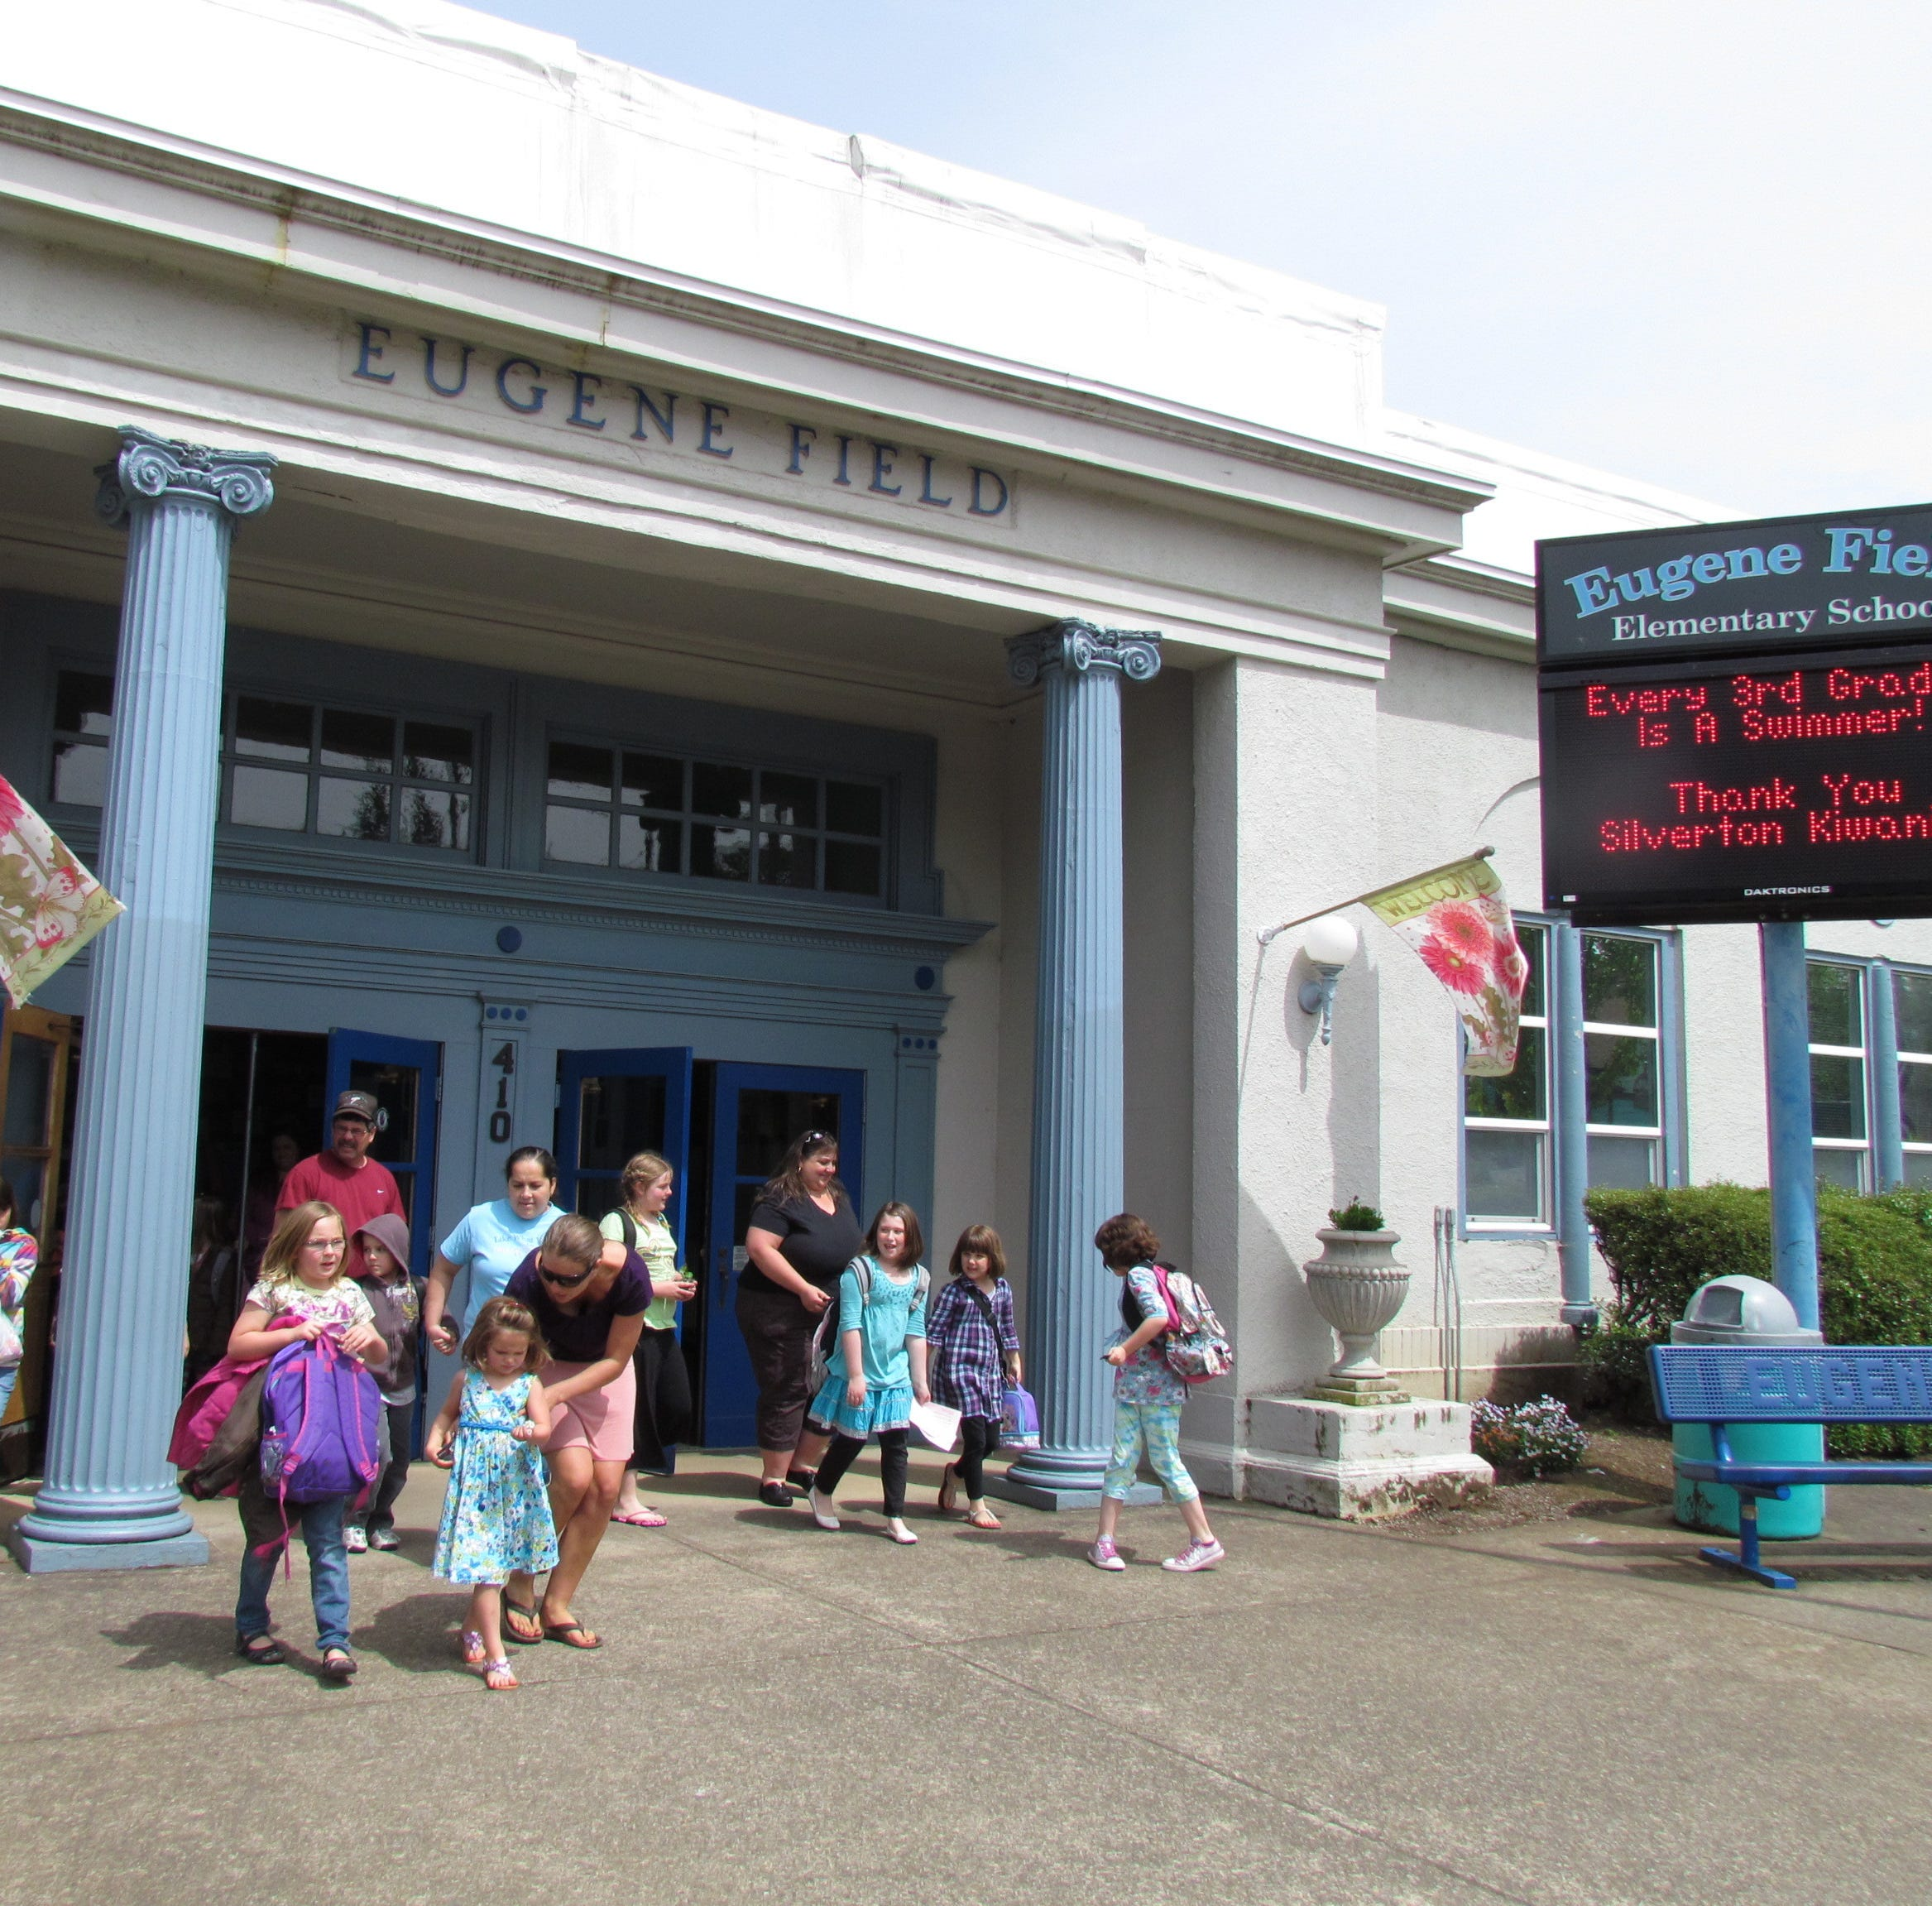 Silverton takes step towards demolishing historic Eugene Field School